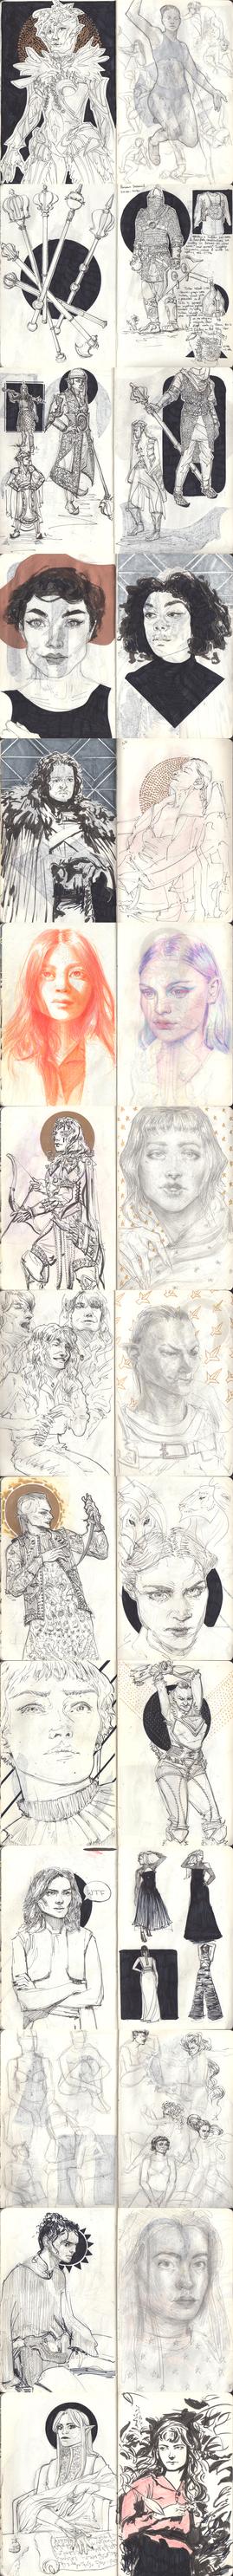 April Sketchdump by lou2209